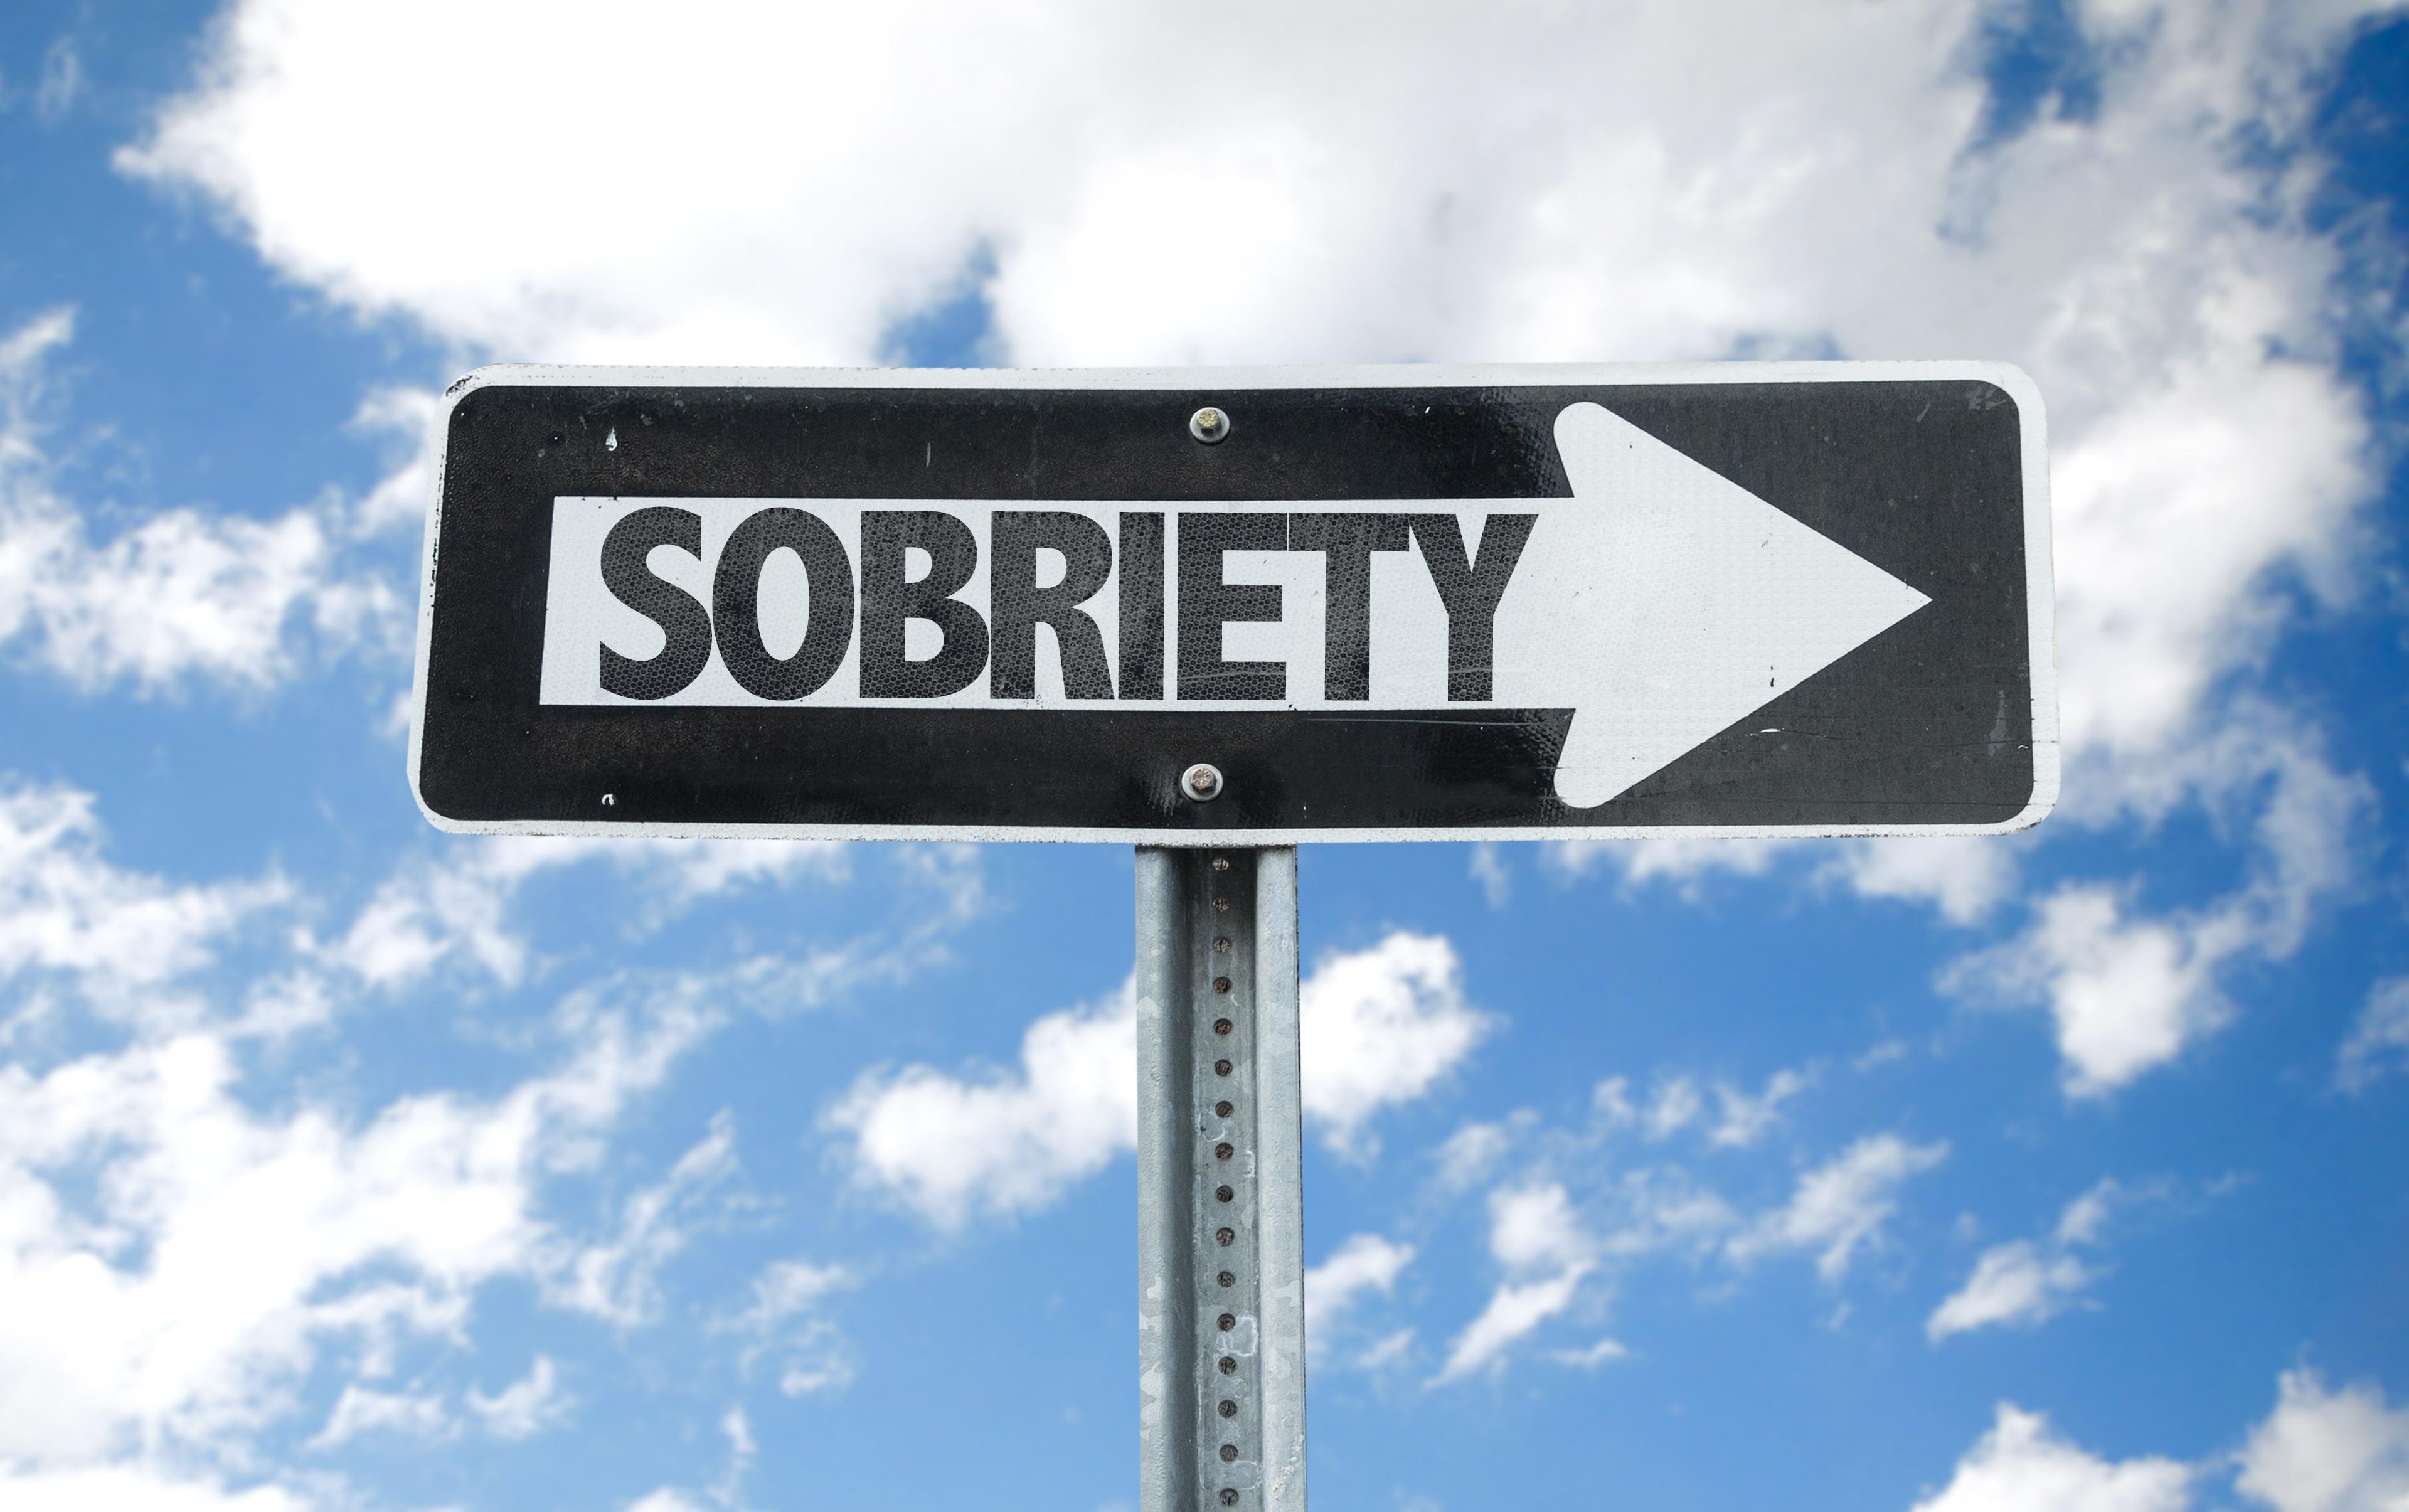 sobriety sign